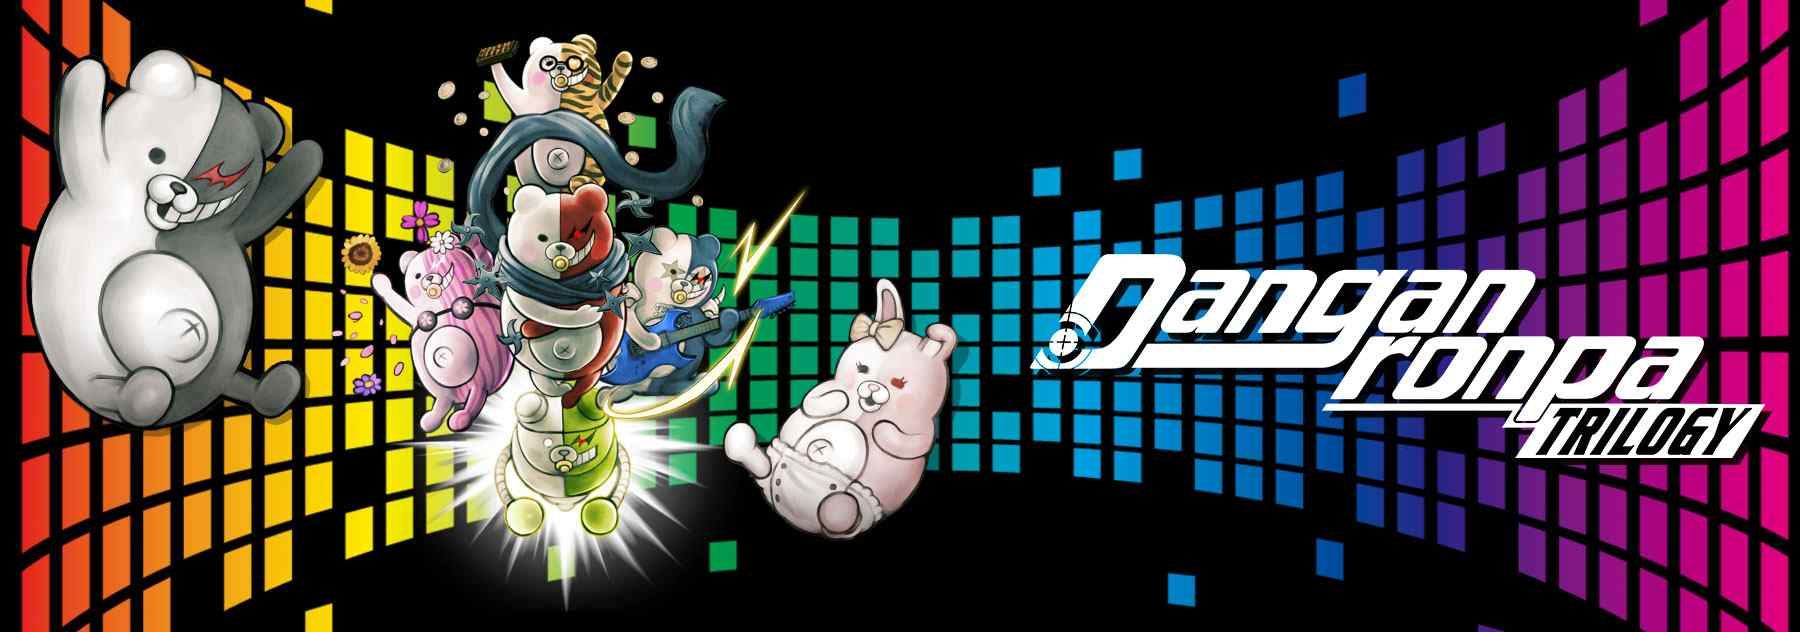 Ukázka z remasteru Shin Megami Tensei III a online u Captaina Tsubasy logo2